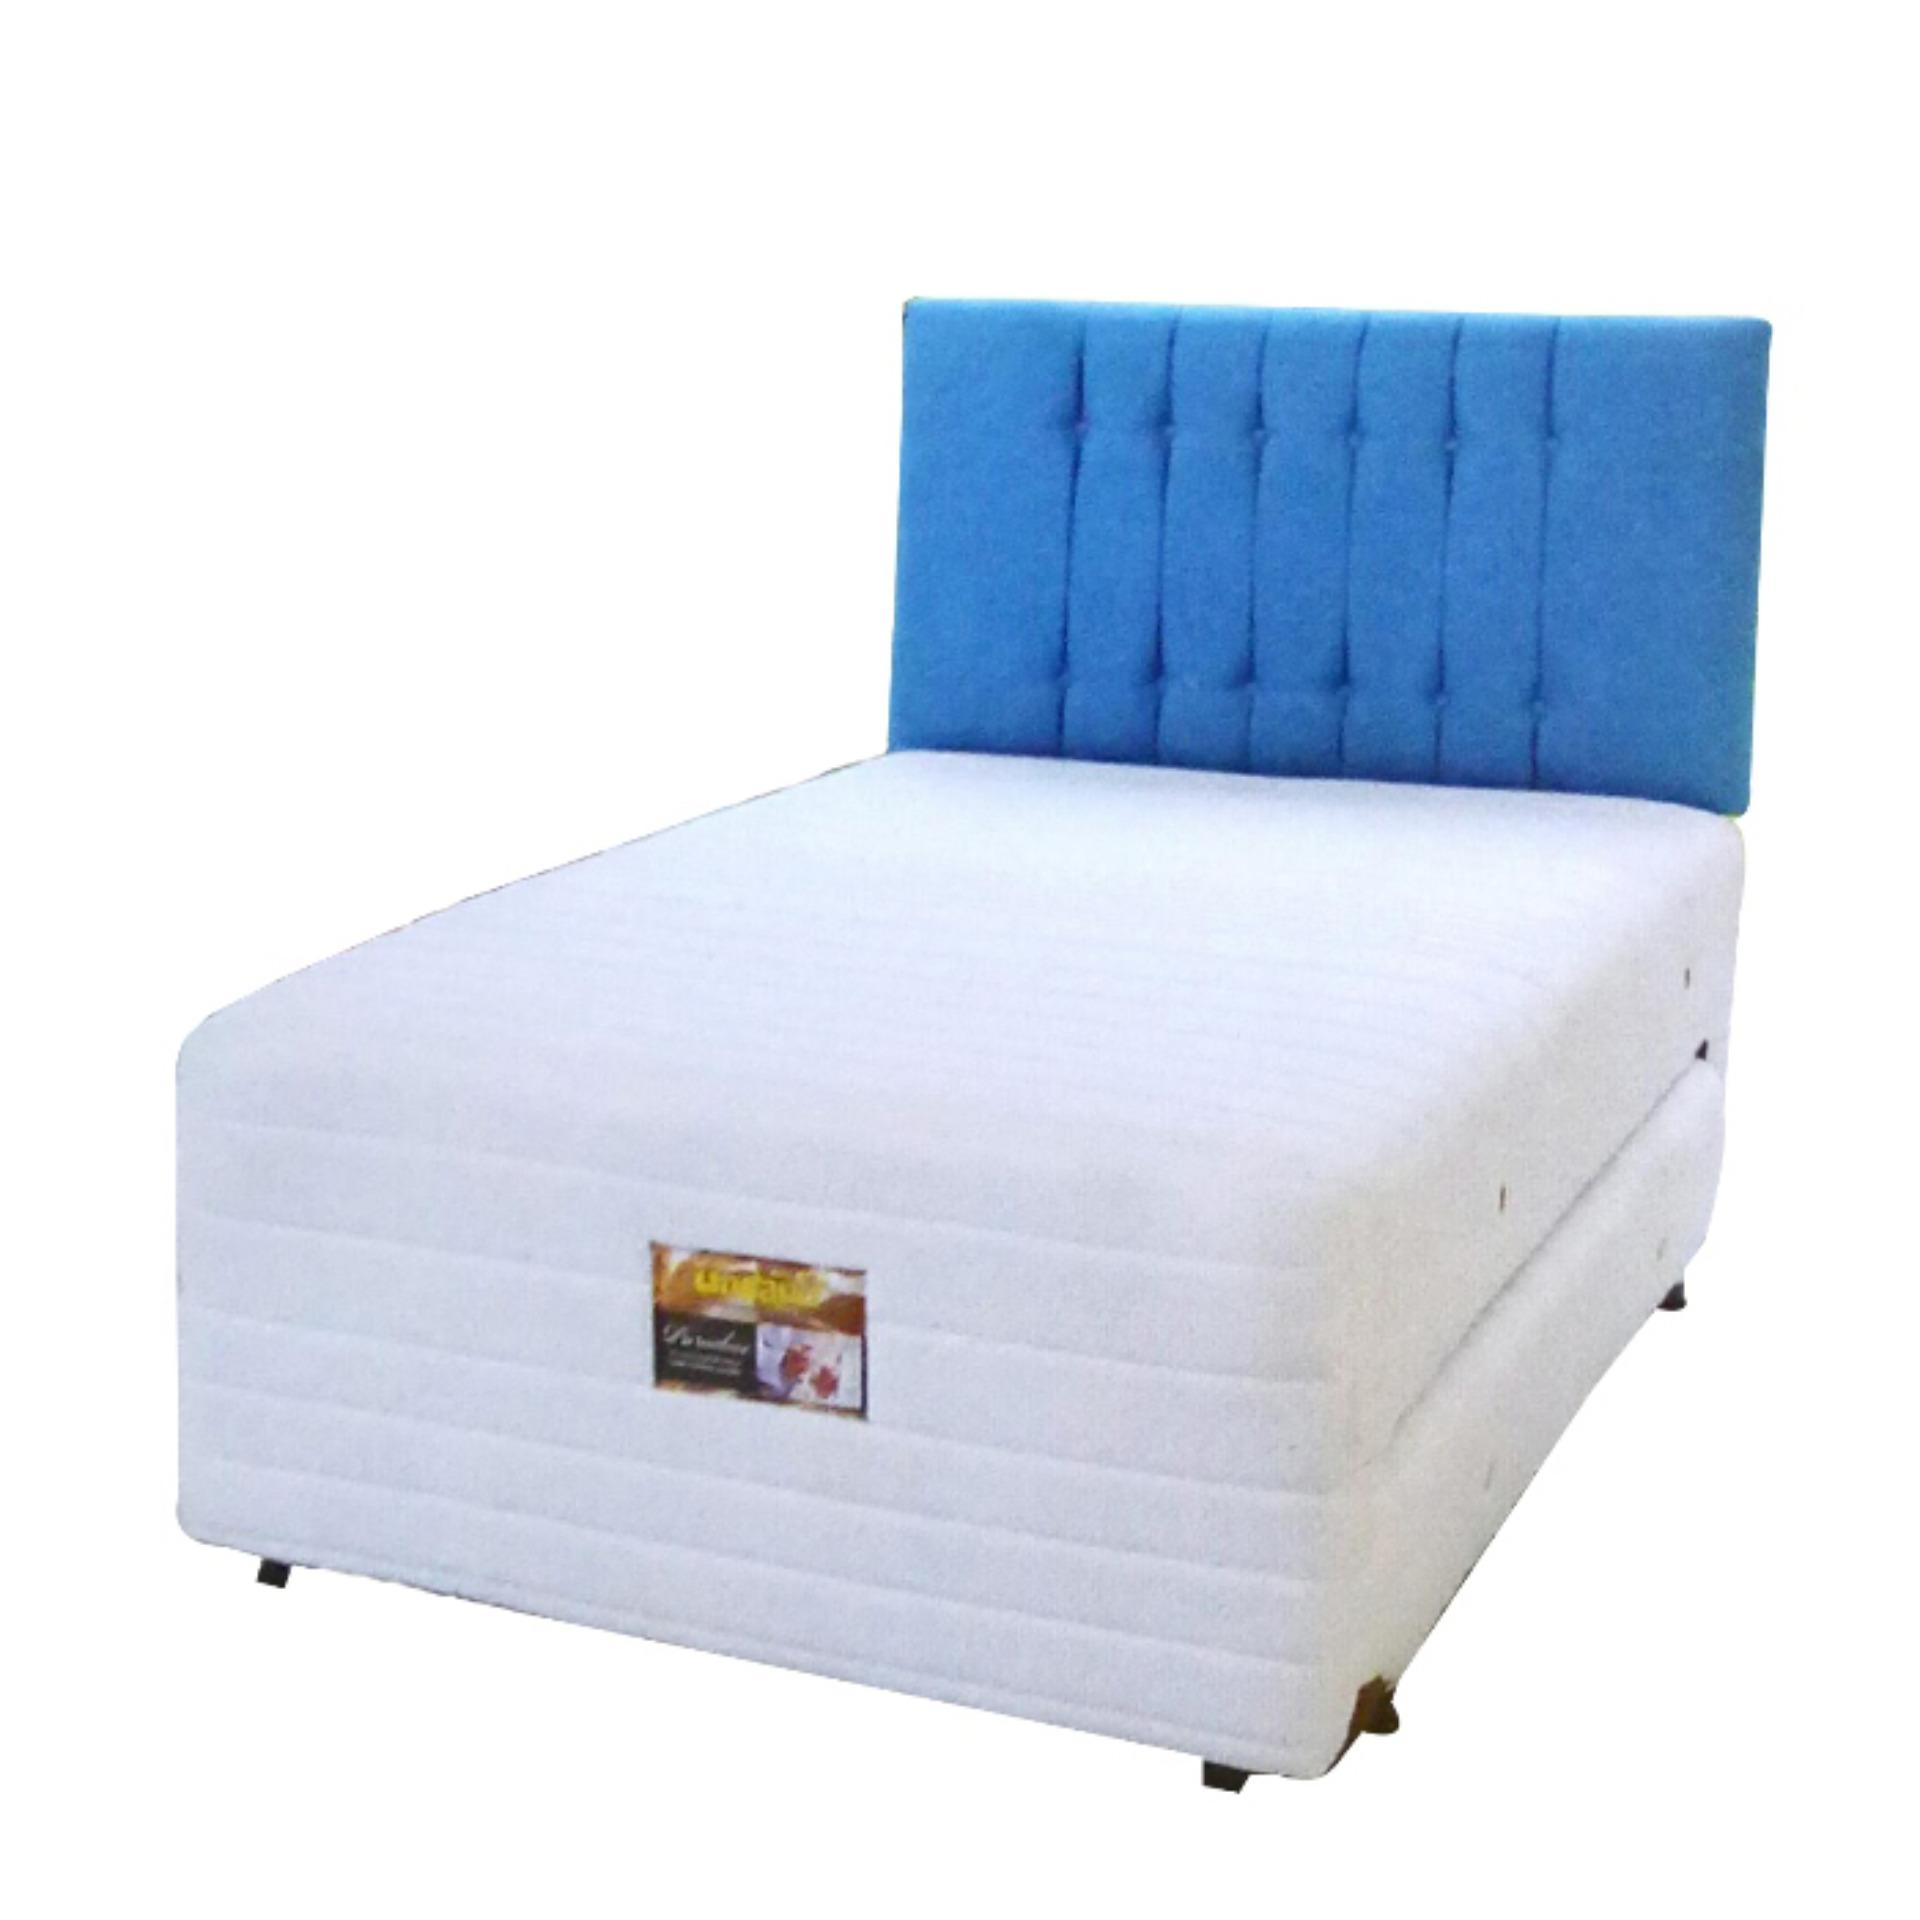 Penawaran Central Spring Bed Deluxe 2 In 1 Florida Komplit Set Kasur Uniland Paradise Single Pillowtop Sofia 90x200 Tanpa Divan Sandaran Jadebotabek Only Jabodetabek 2in1 Spectra Suede